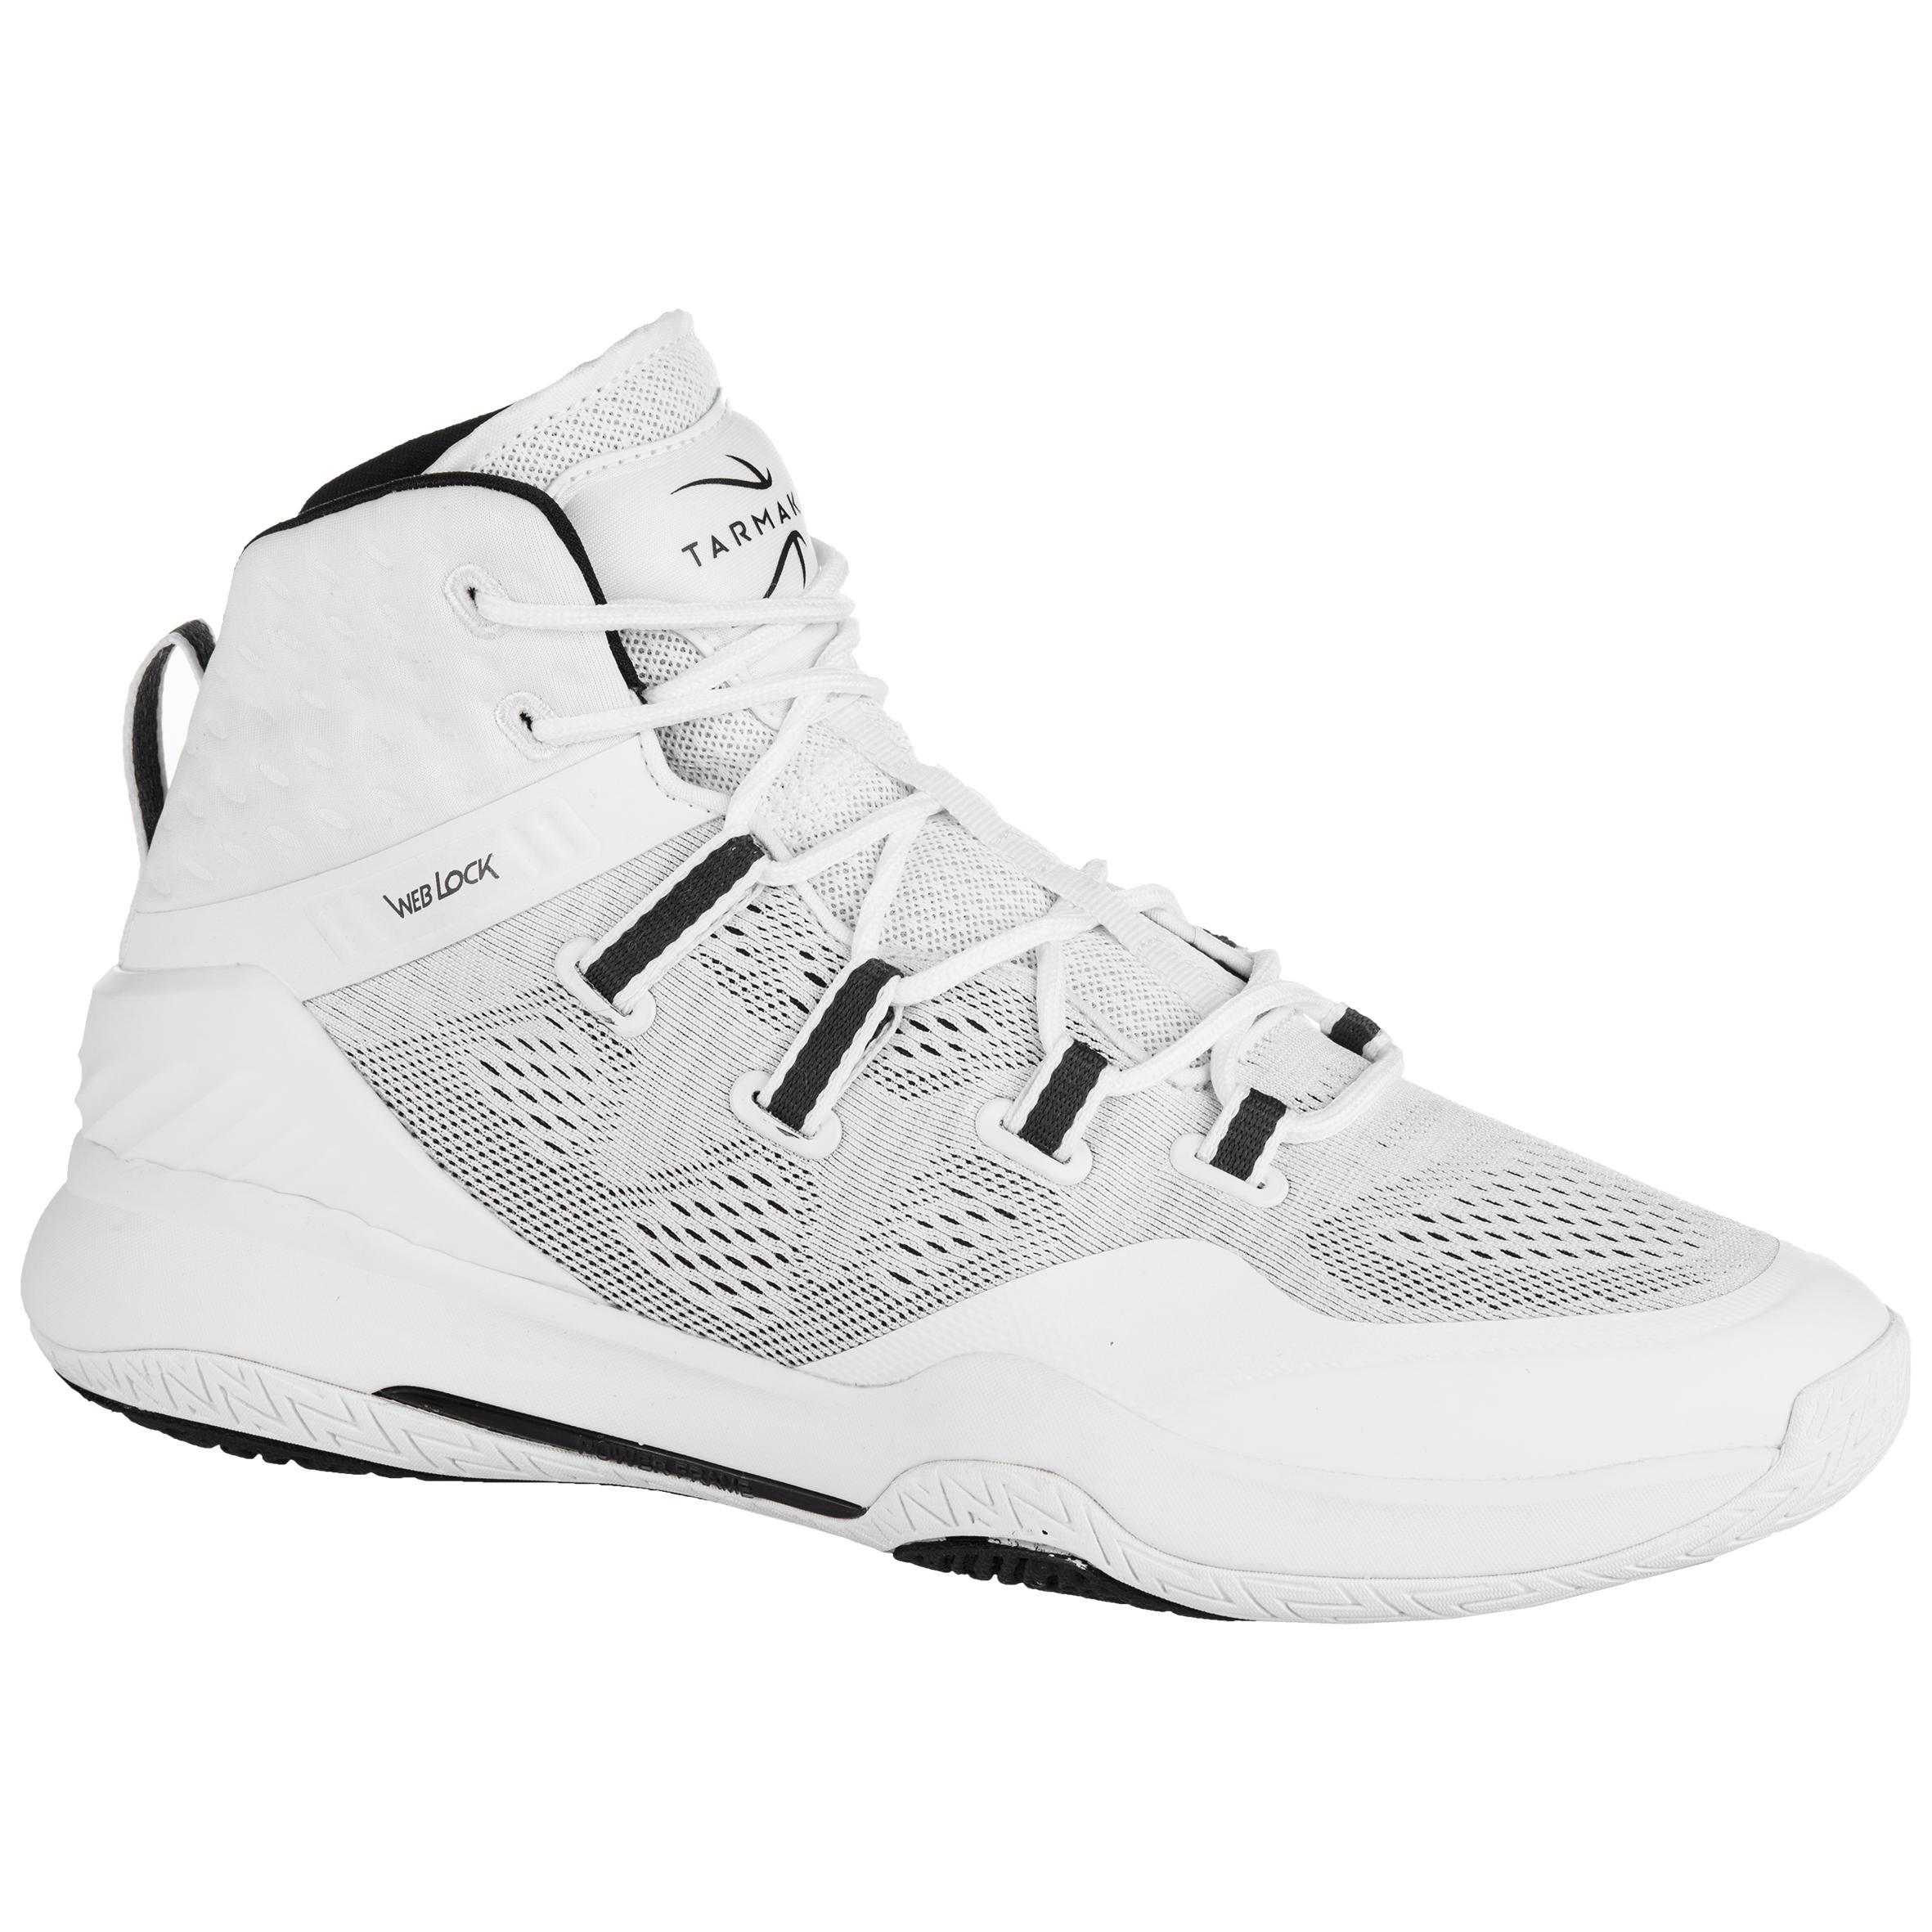 c100eea0cf8 Baskets Homme